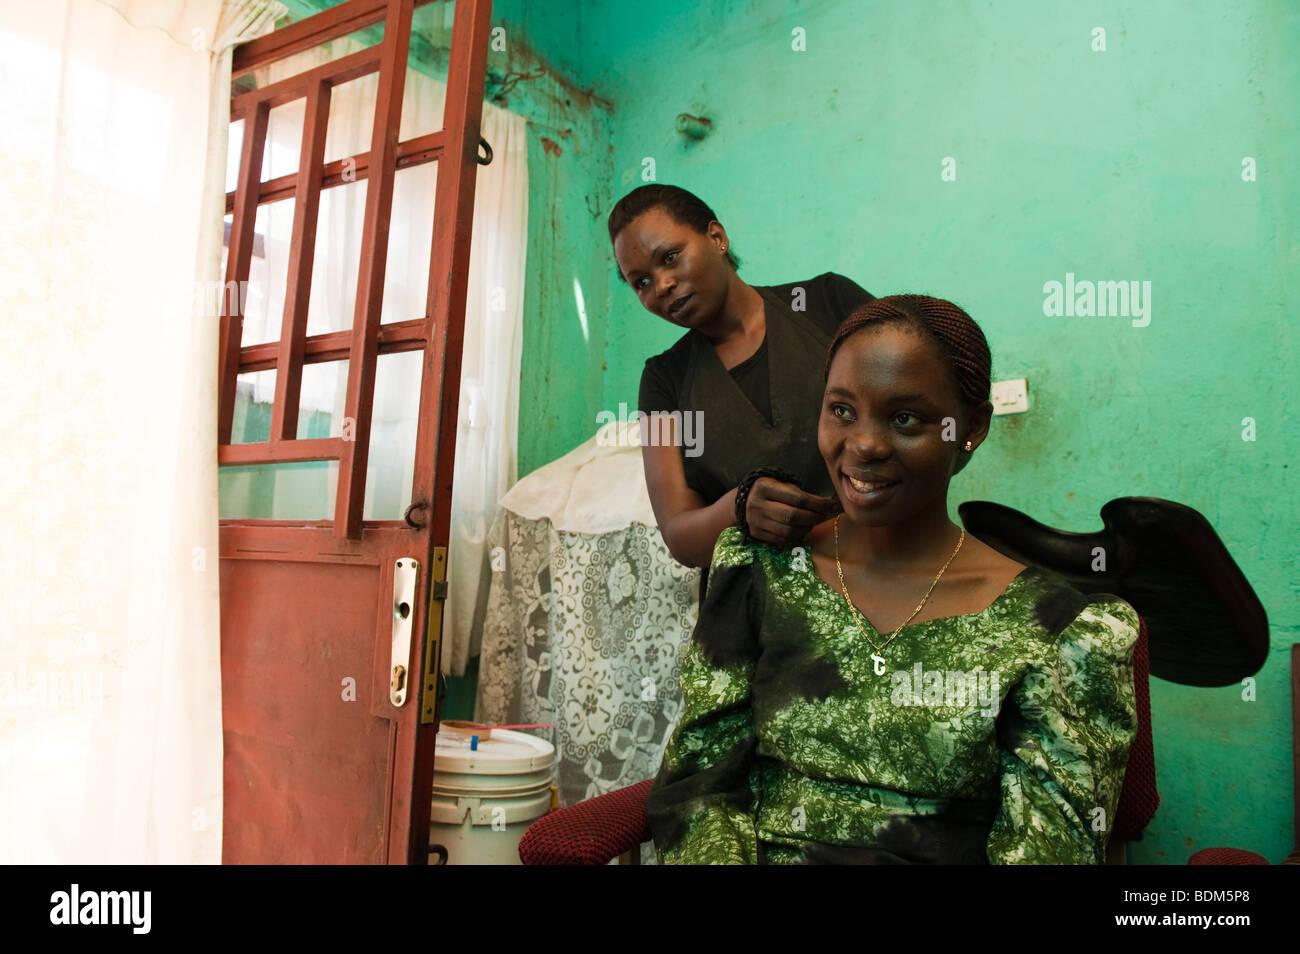 Hairdresser, Kigali, Rwanda - Stock Image